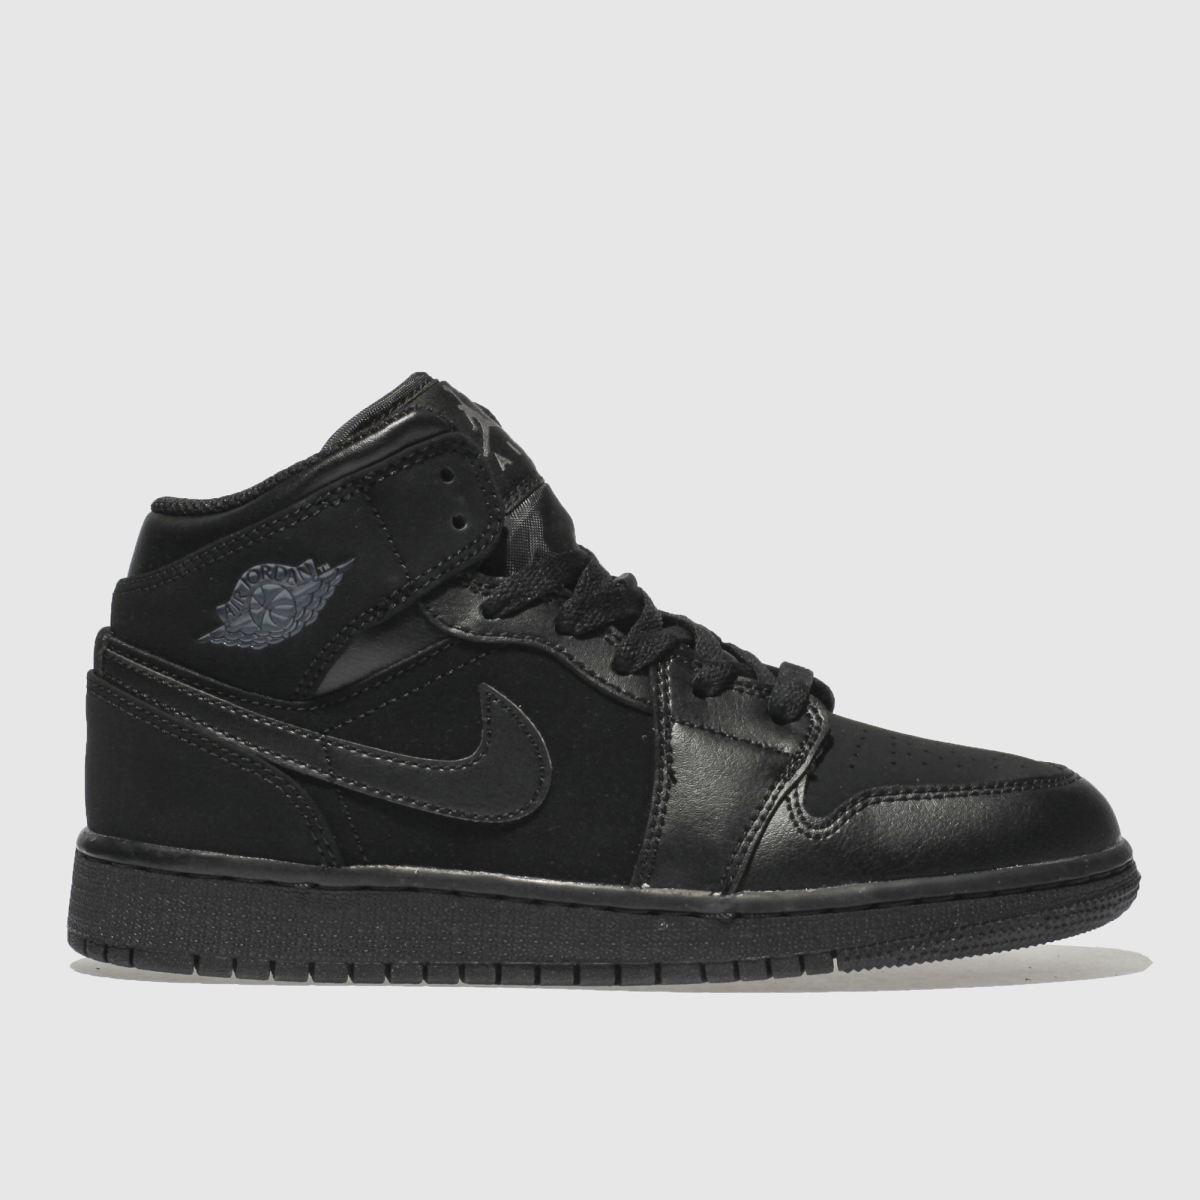 Nike Jordan Black & Grey 1 Mid Trainers Youth